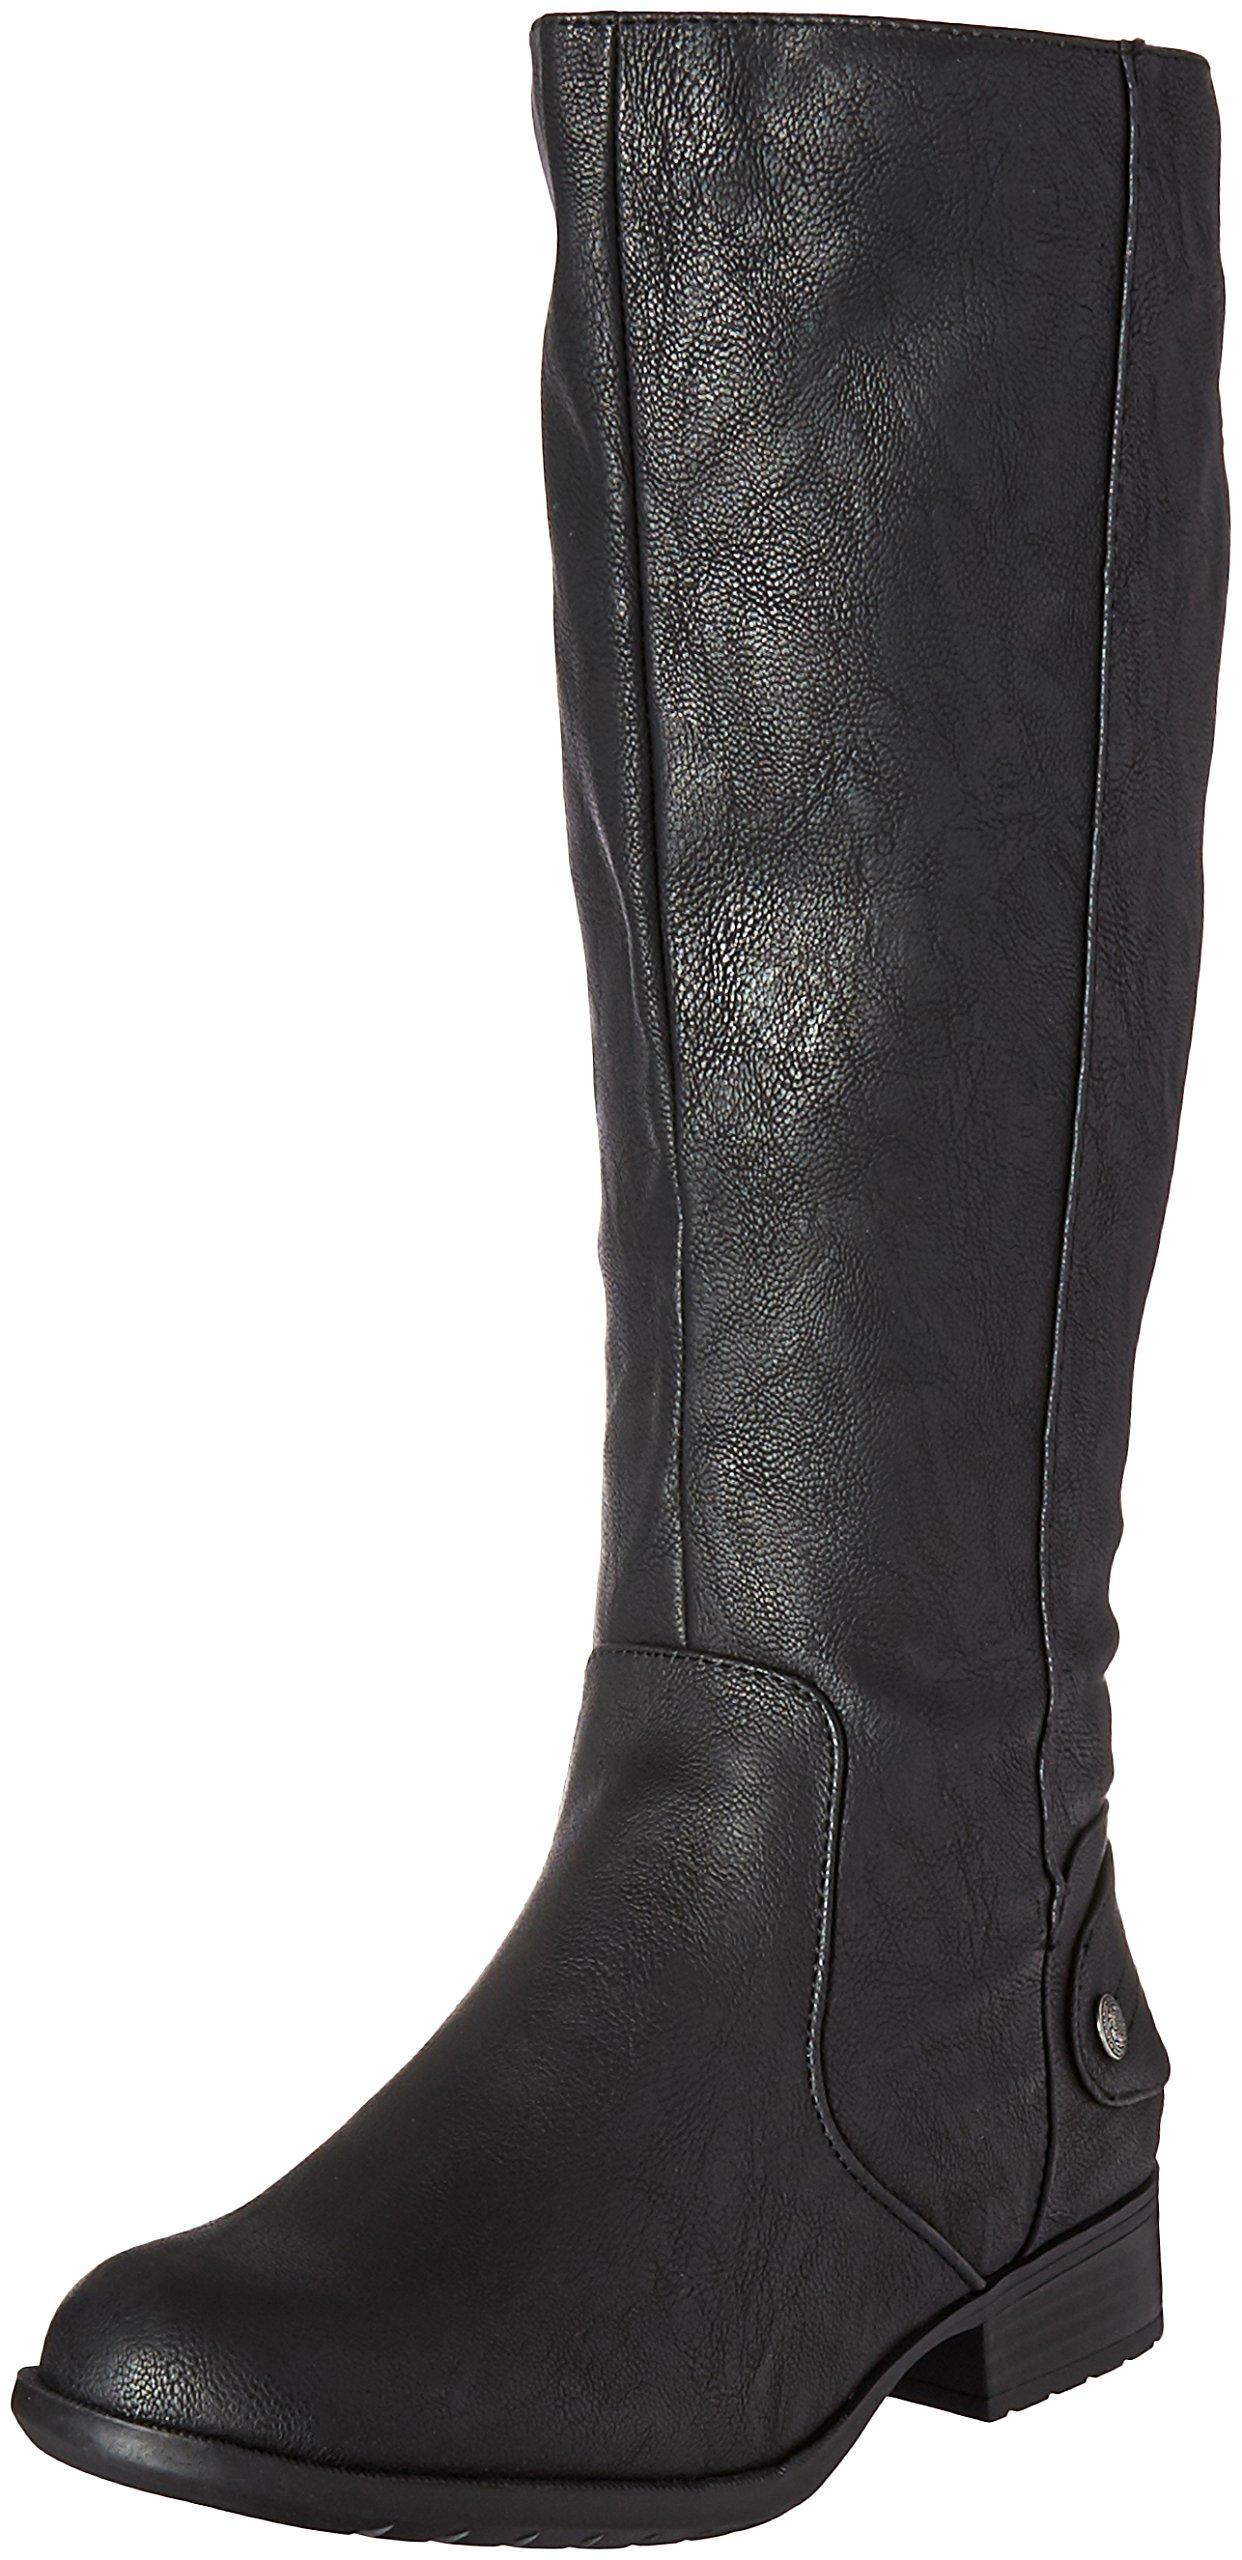 LifeStride Women's Xandy Riding Boot, Black, 9.5 W US